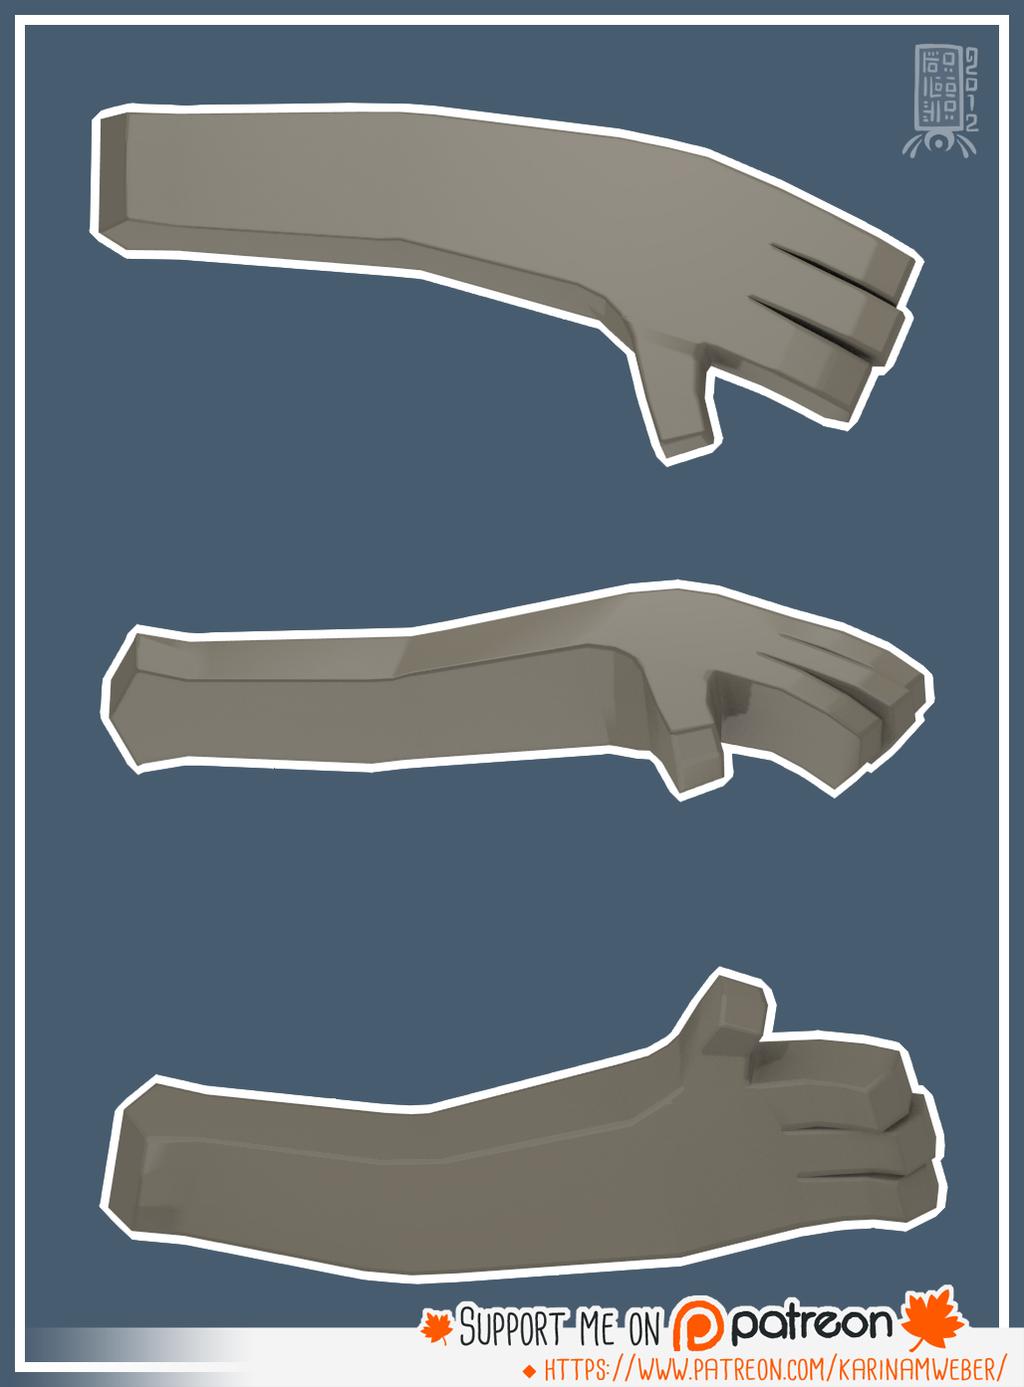 Most recent image: Hand Test I